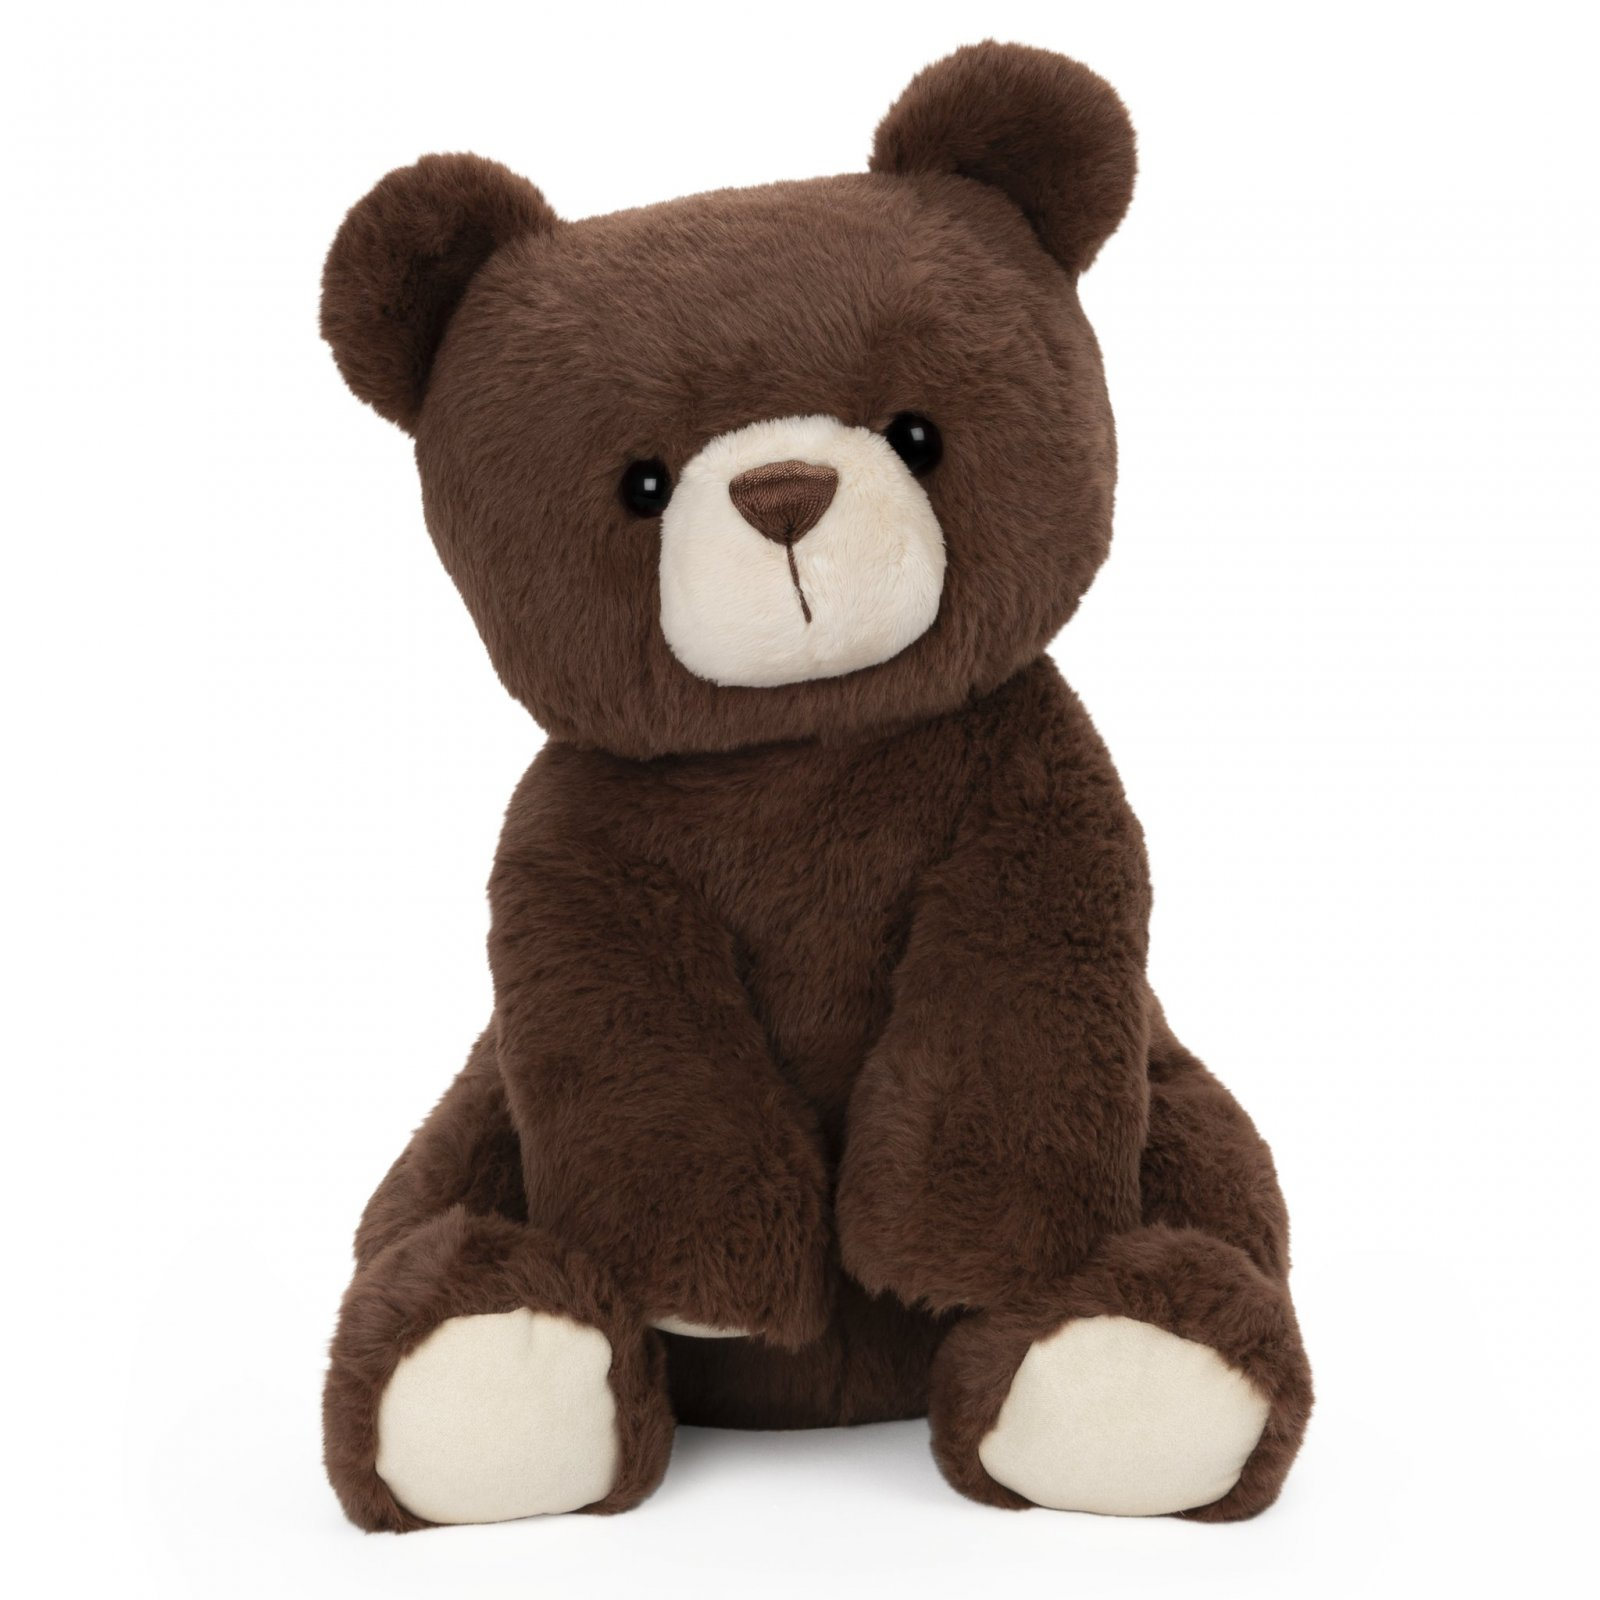 Gund Brown Bear Finley Teddy Bear 13